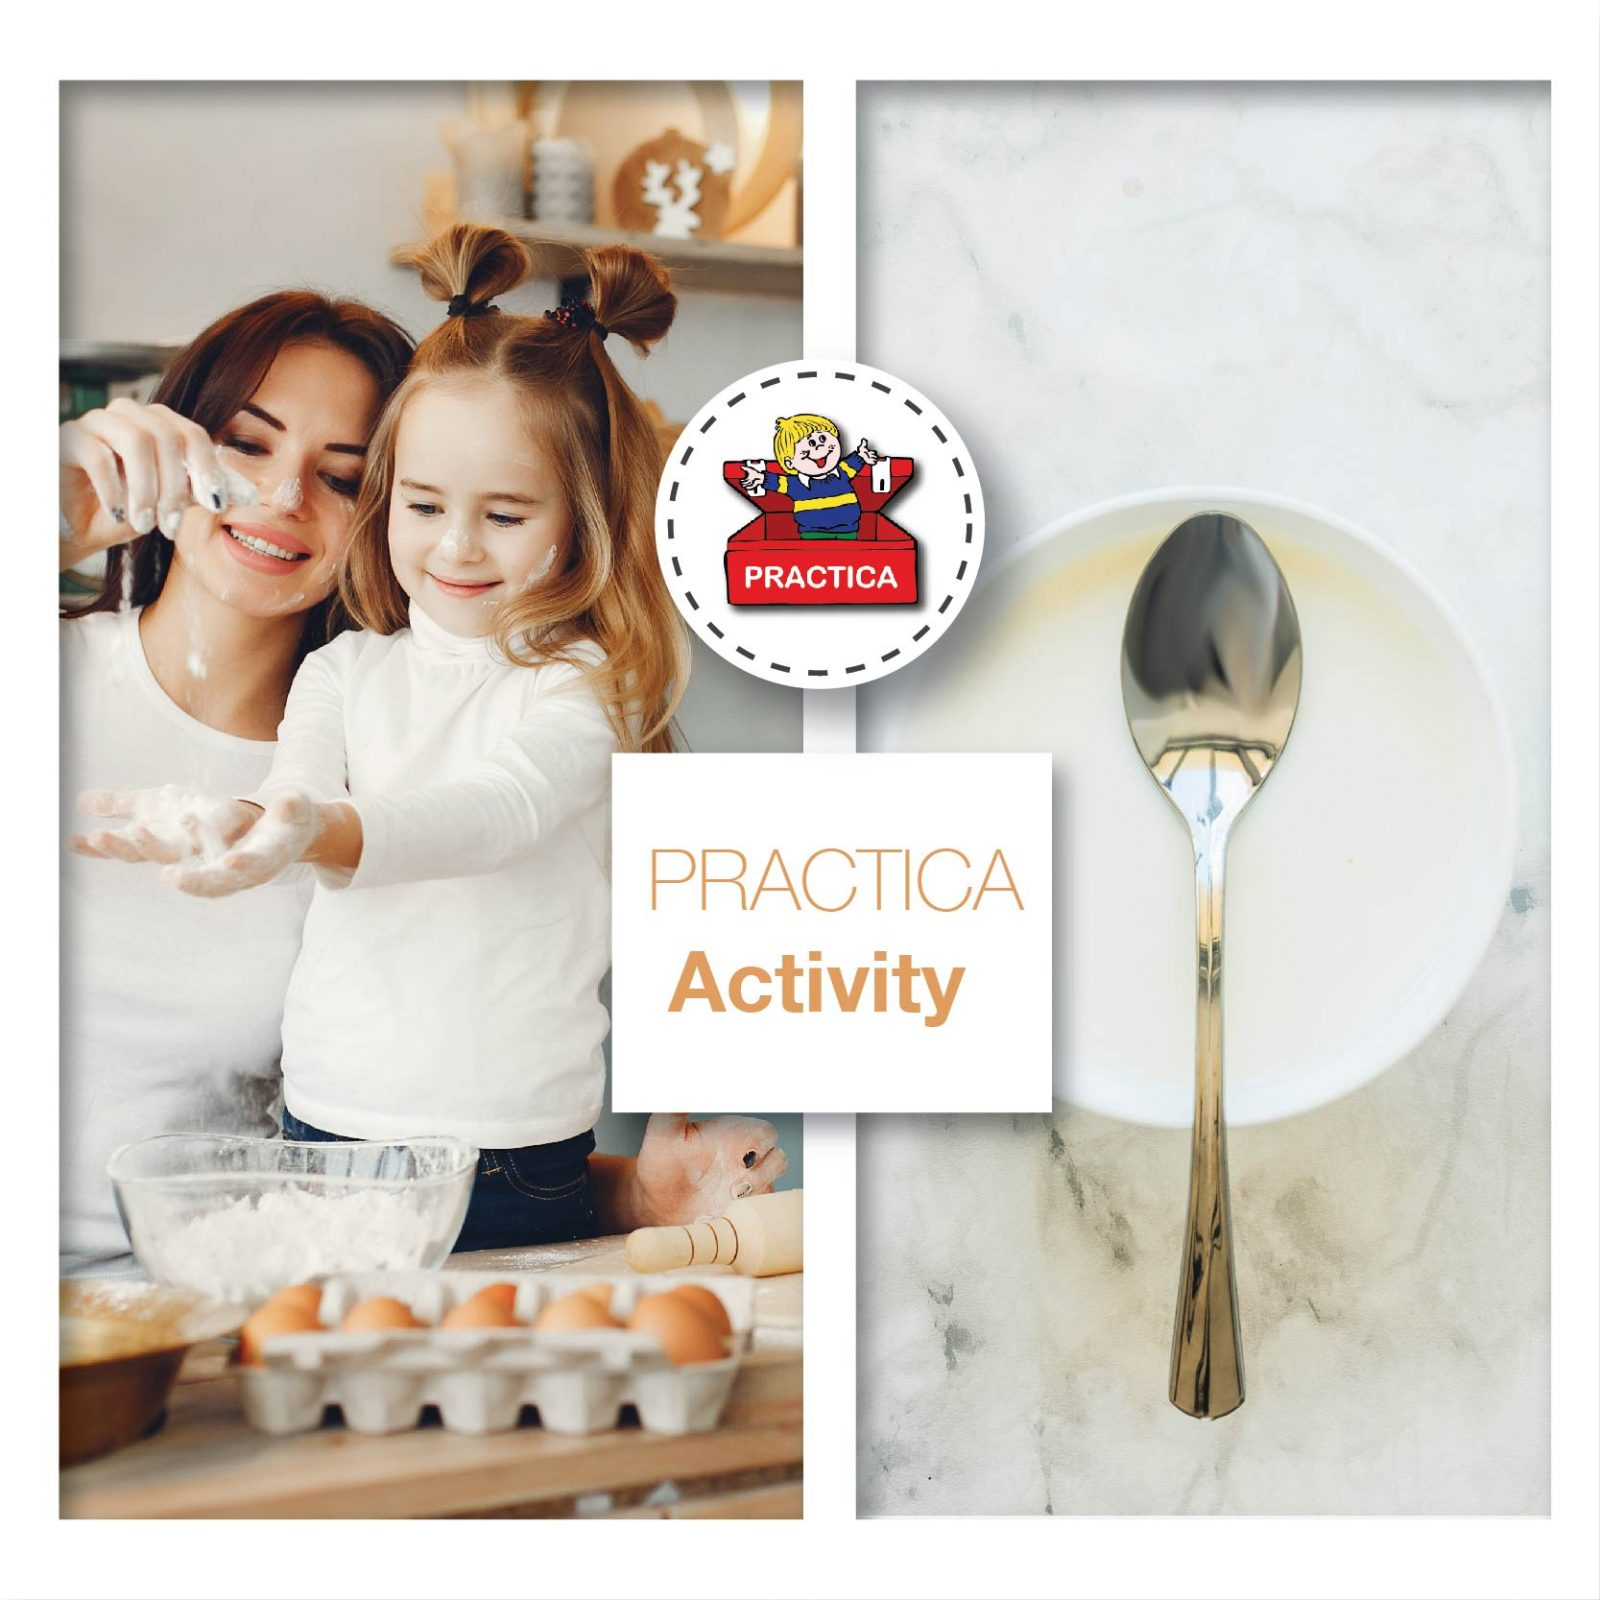 Practica Activity - Spatial Words